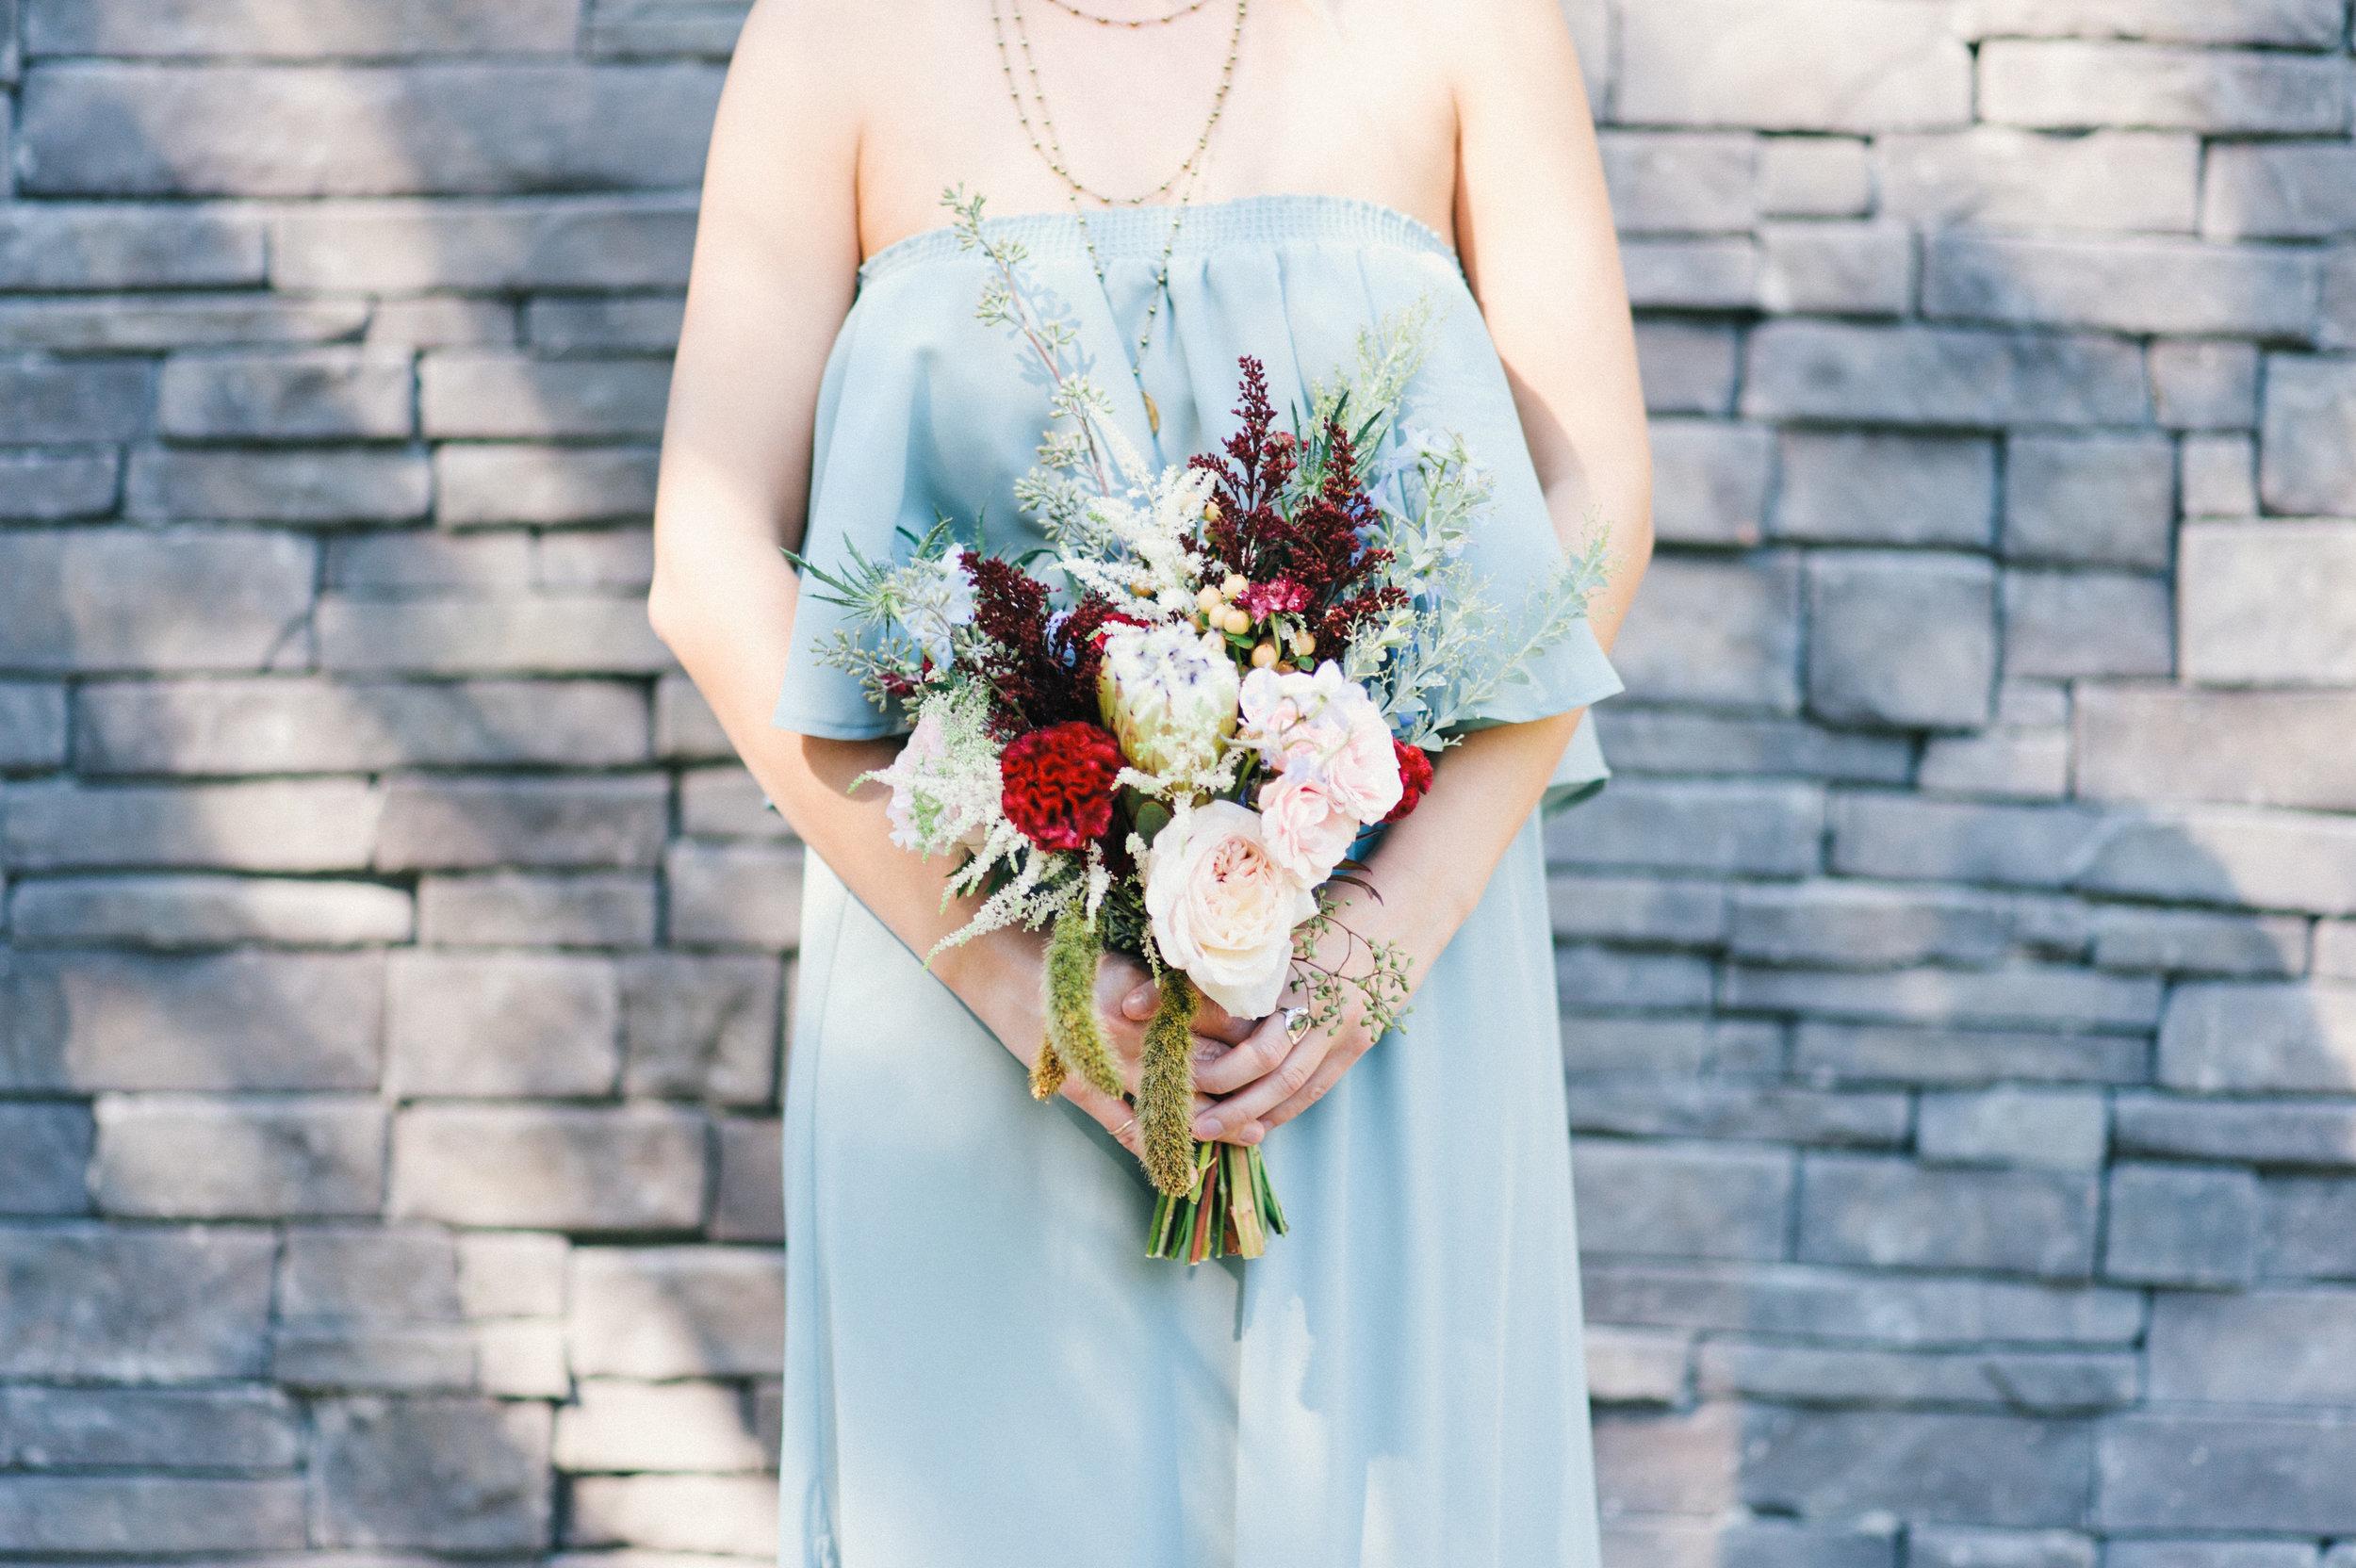 kristin-and-peter-atlanta-georgia-wedding-october-8th-2016 (72 of 1068).jpg